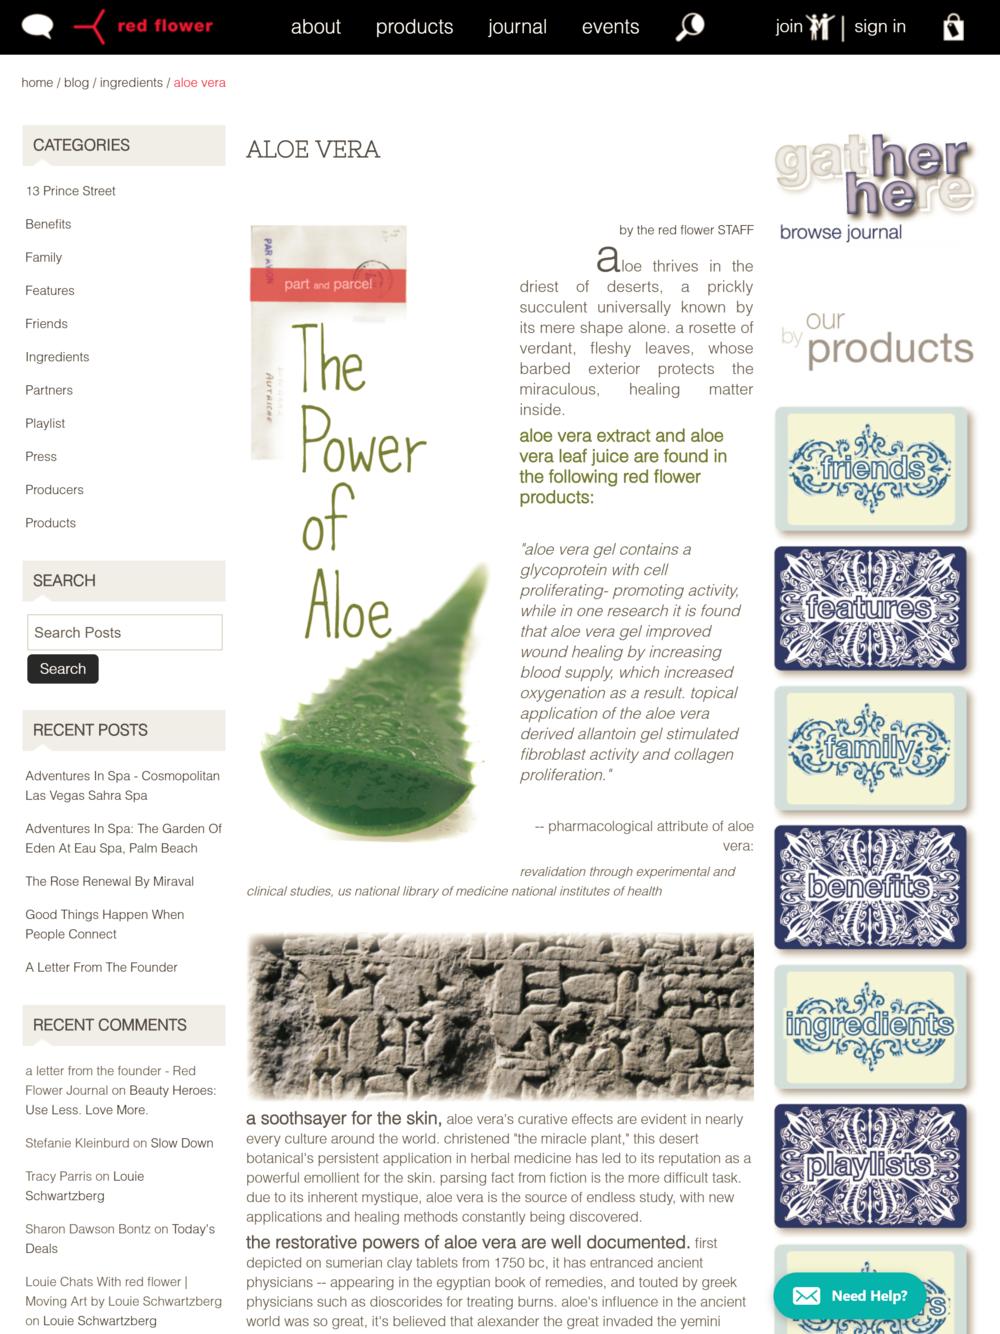 redflower.com_blog_part-and-parcel_aloe-vera(iPad Pro).png